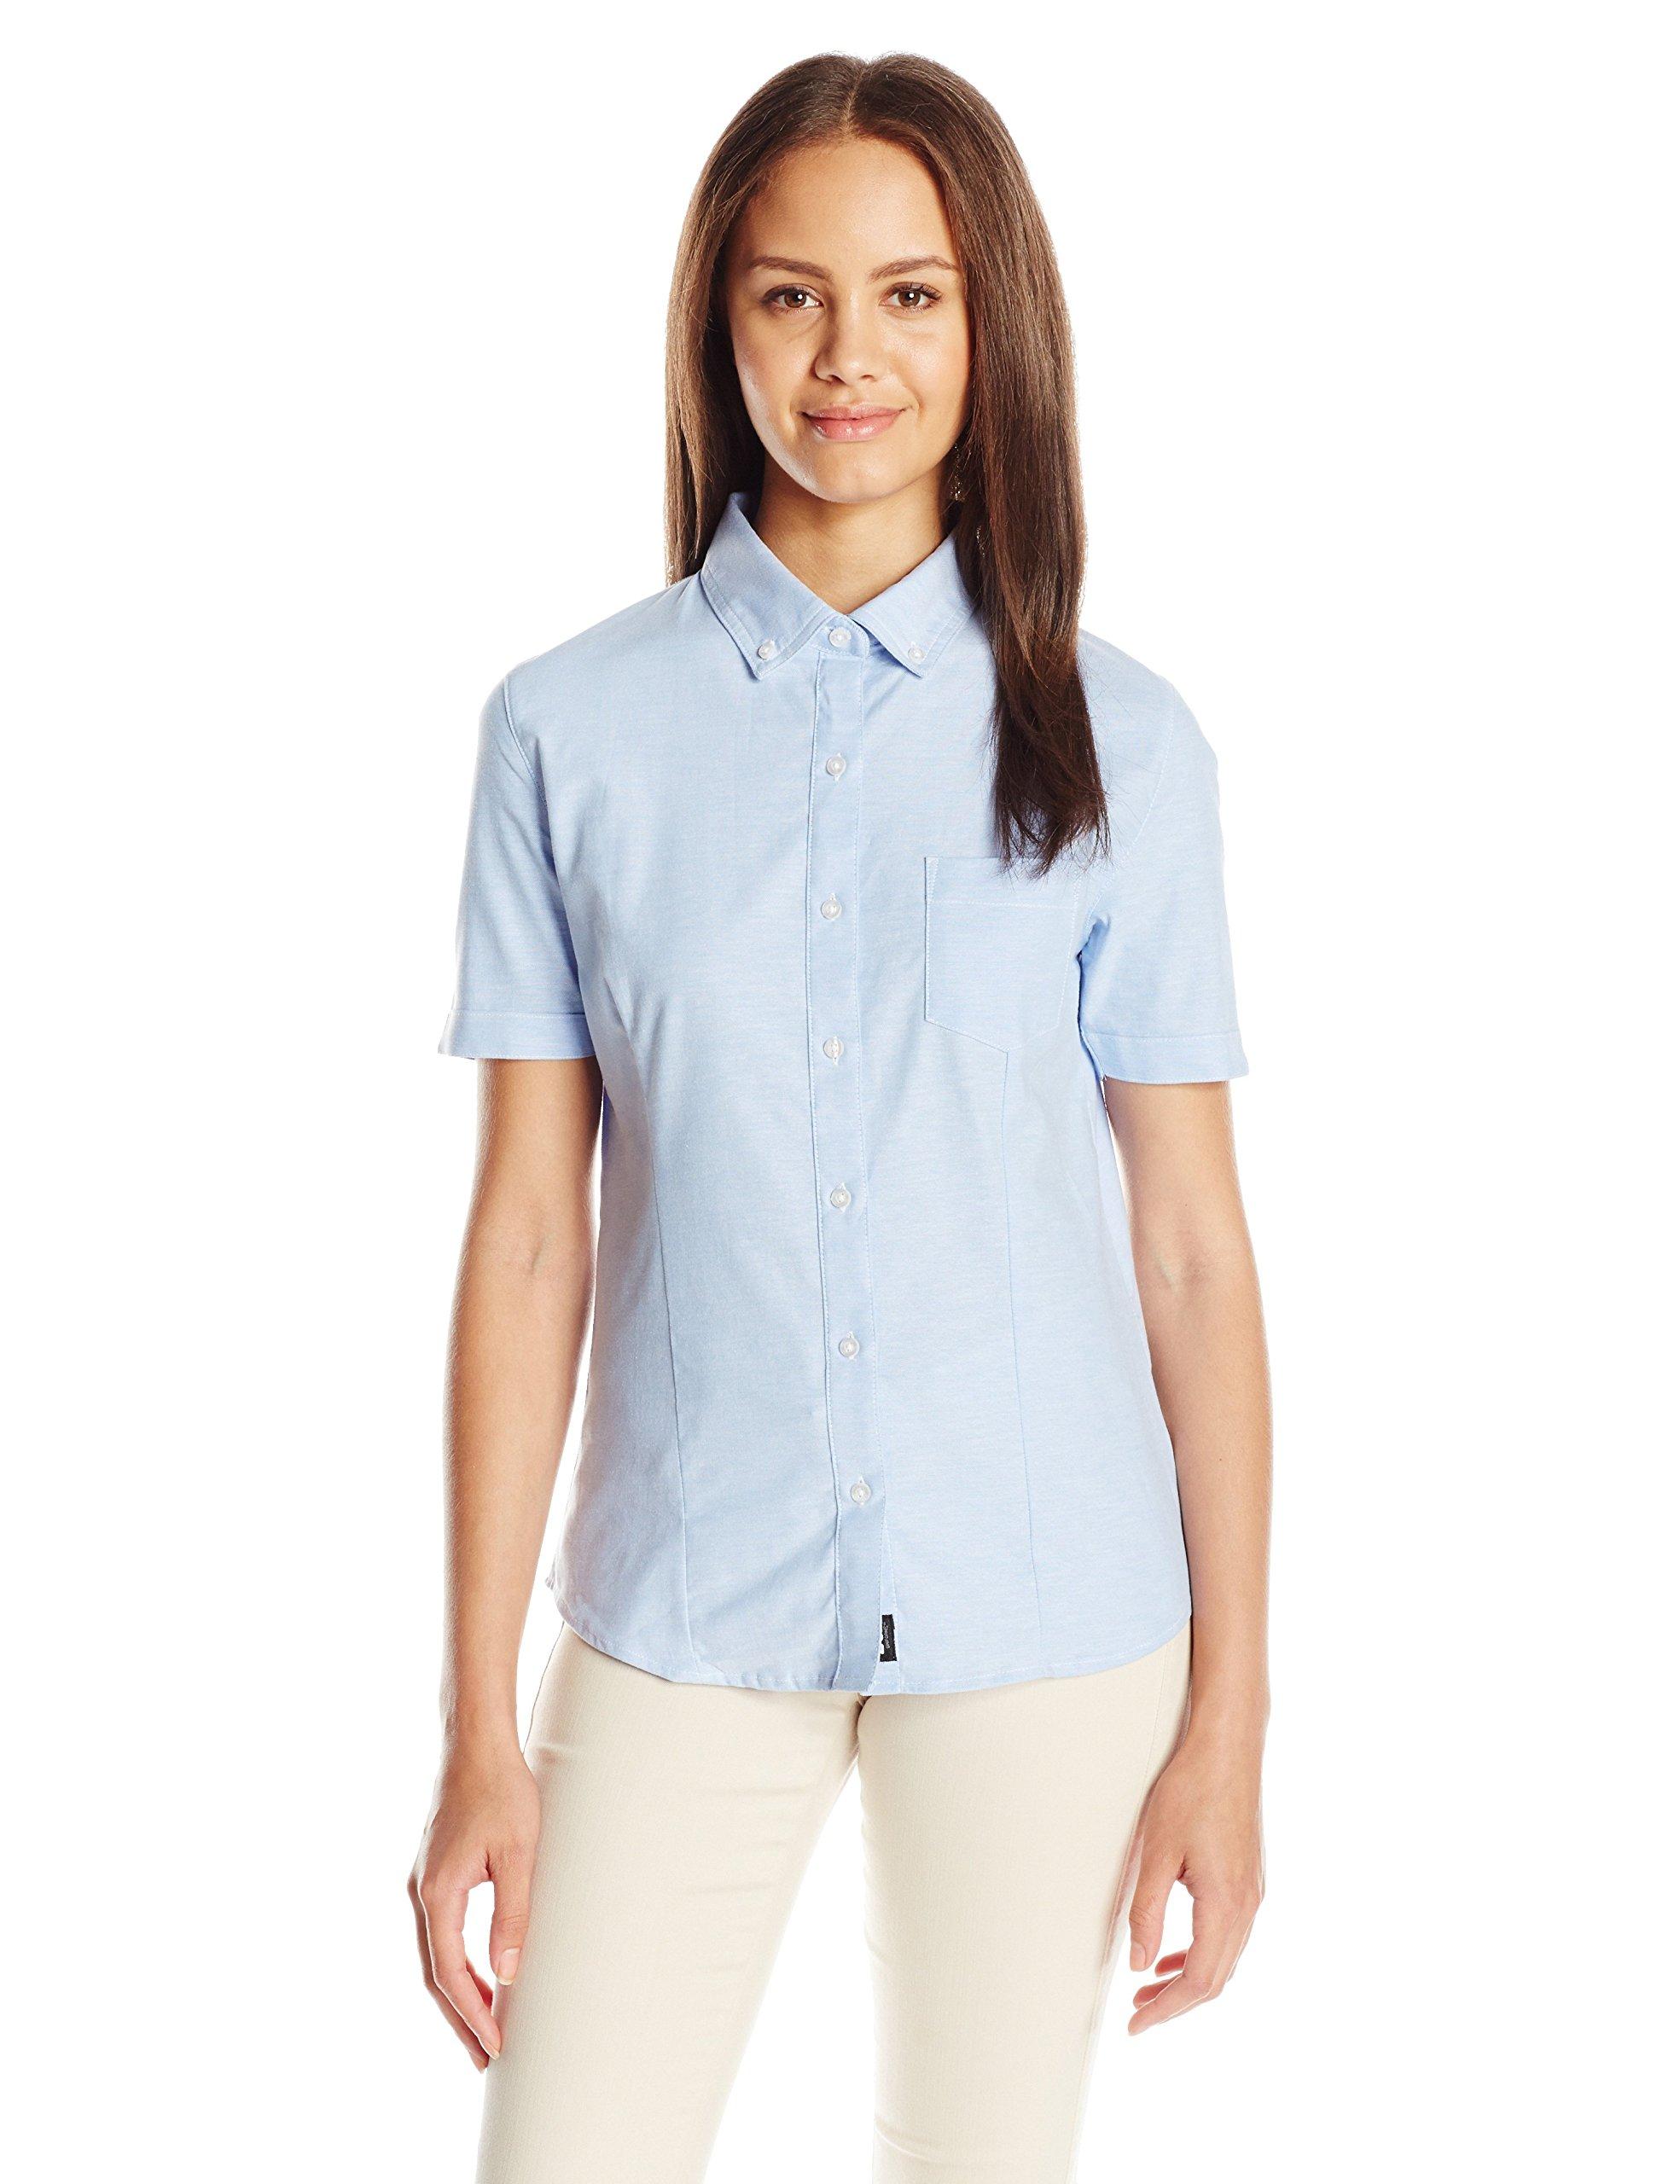 LEE Uniforms Junior's Short Sleeve Stretch Oxford Blouse, Light Blue, X-Large